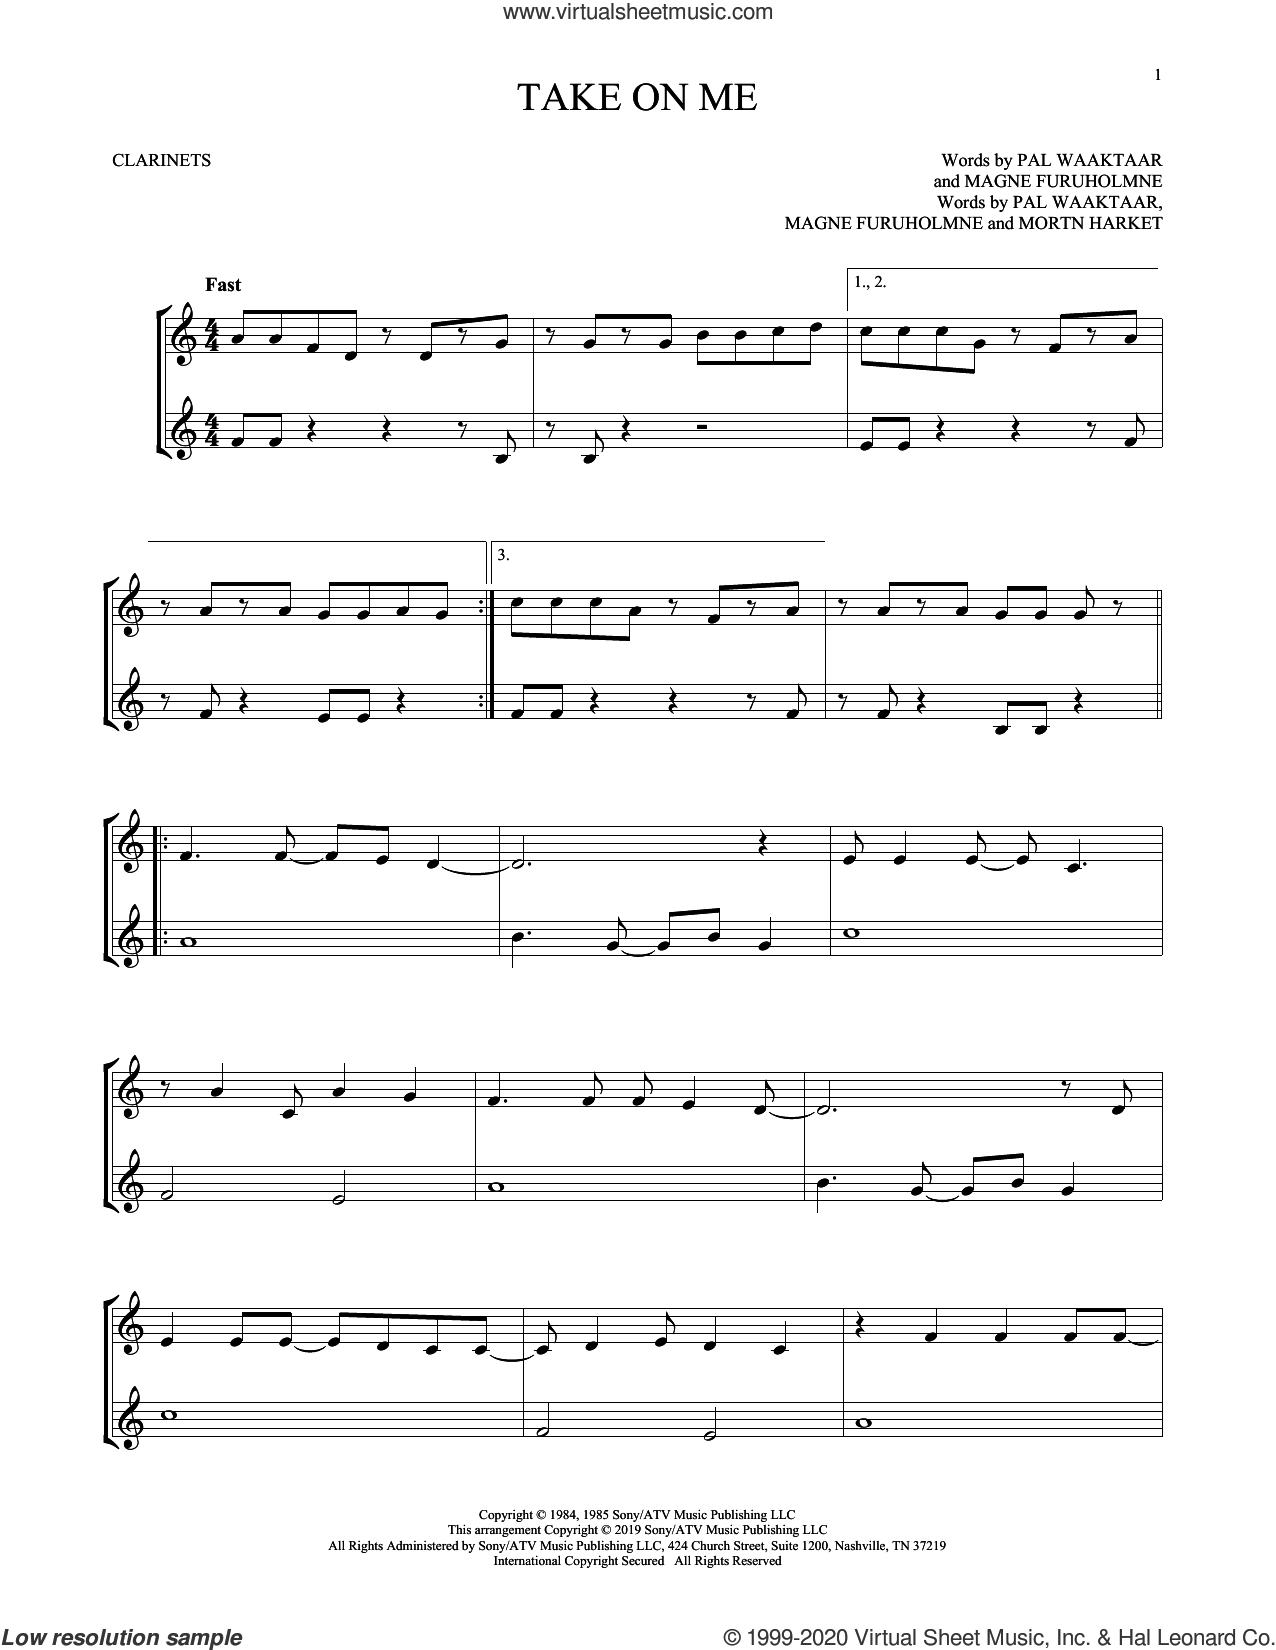 Take On Me sheet music for two clarinets (duets) by a-ha, Magne Furuholmne, Morton Harket and Pal Waaktaar, intermediate skill level